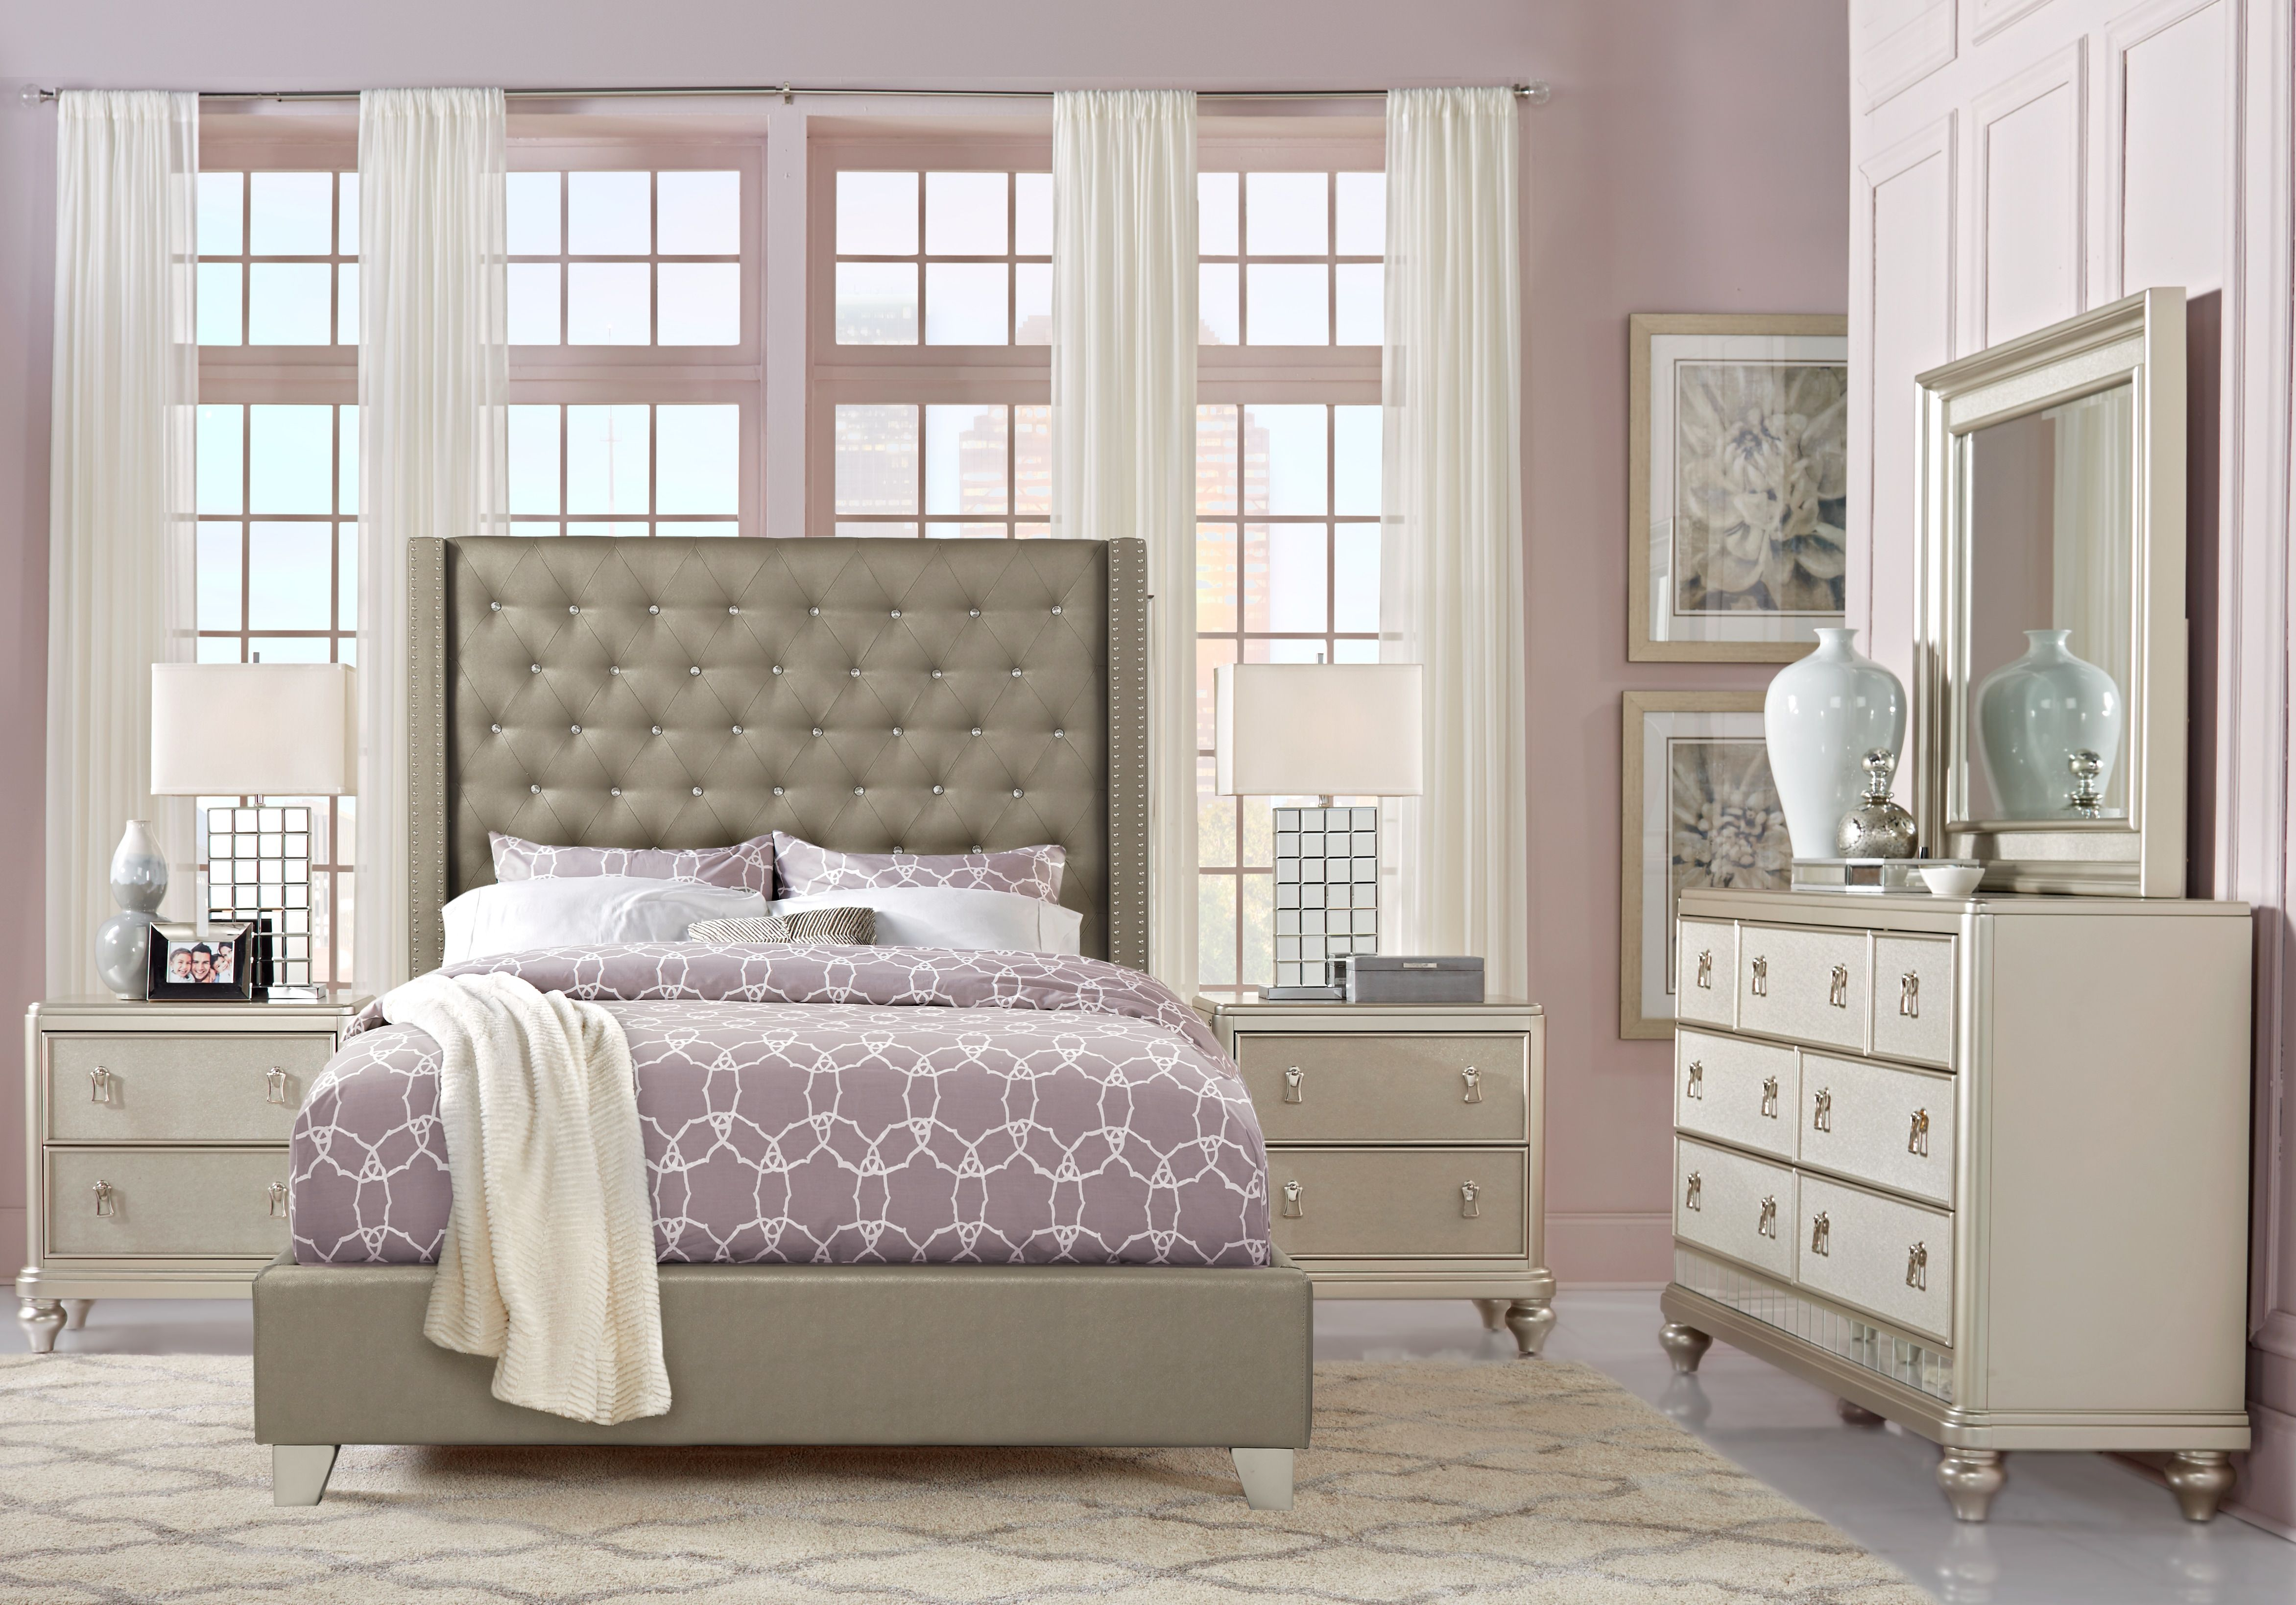 Sofia Vergara Paris Silver 7 Pc King Upholstered Bedroom